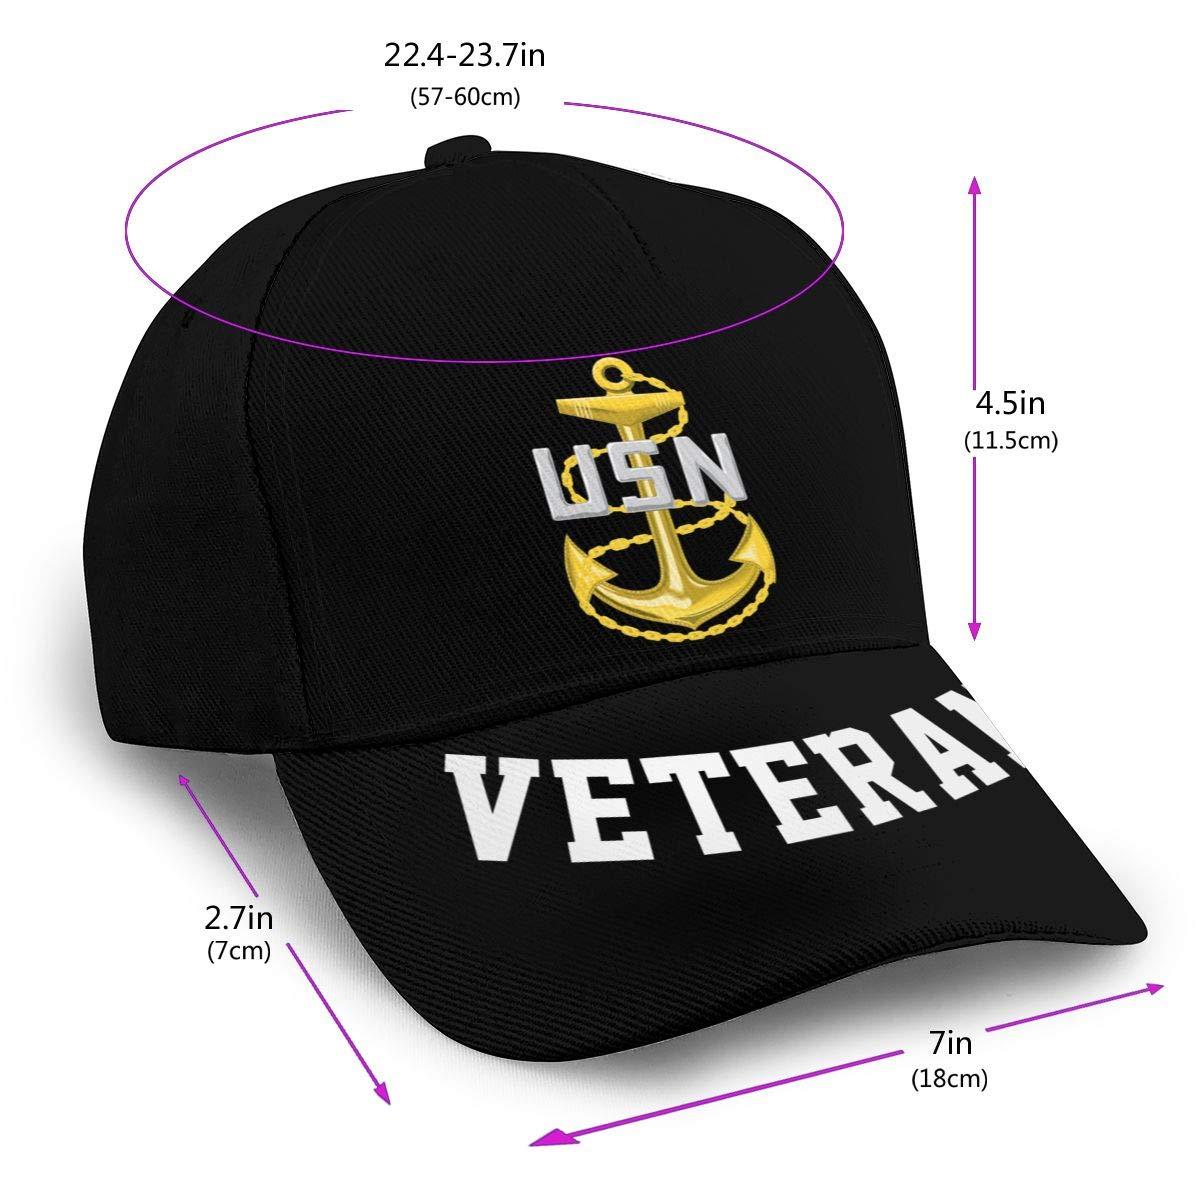 Navy Chief Petty Officer Baseball Cap Dad Hat Unisex Classic Sports Hat Peaked Cap Veteran Hat